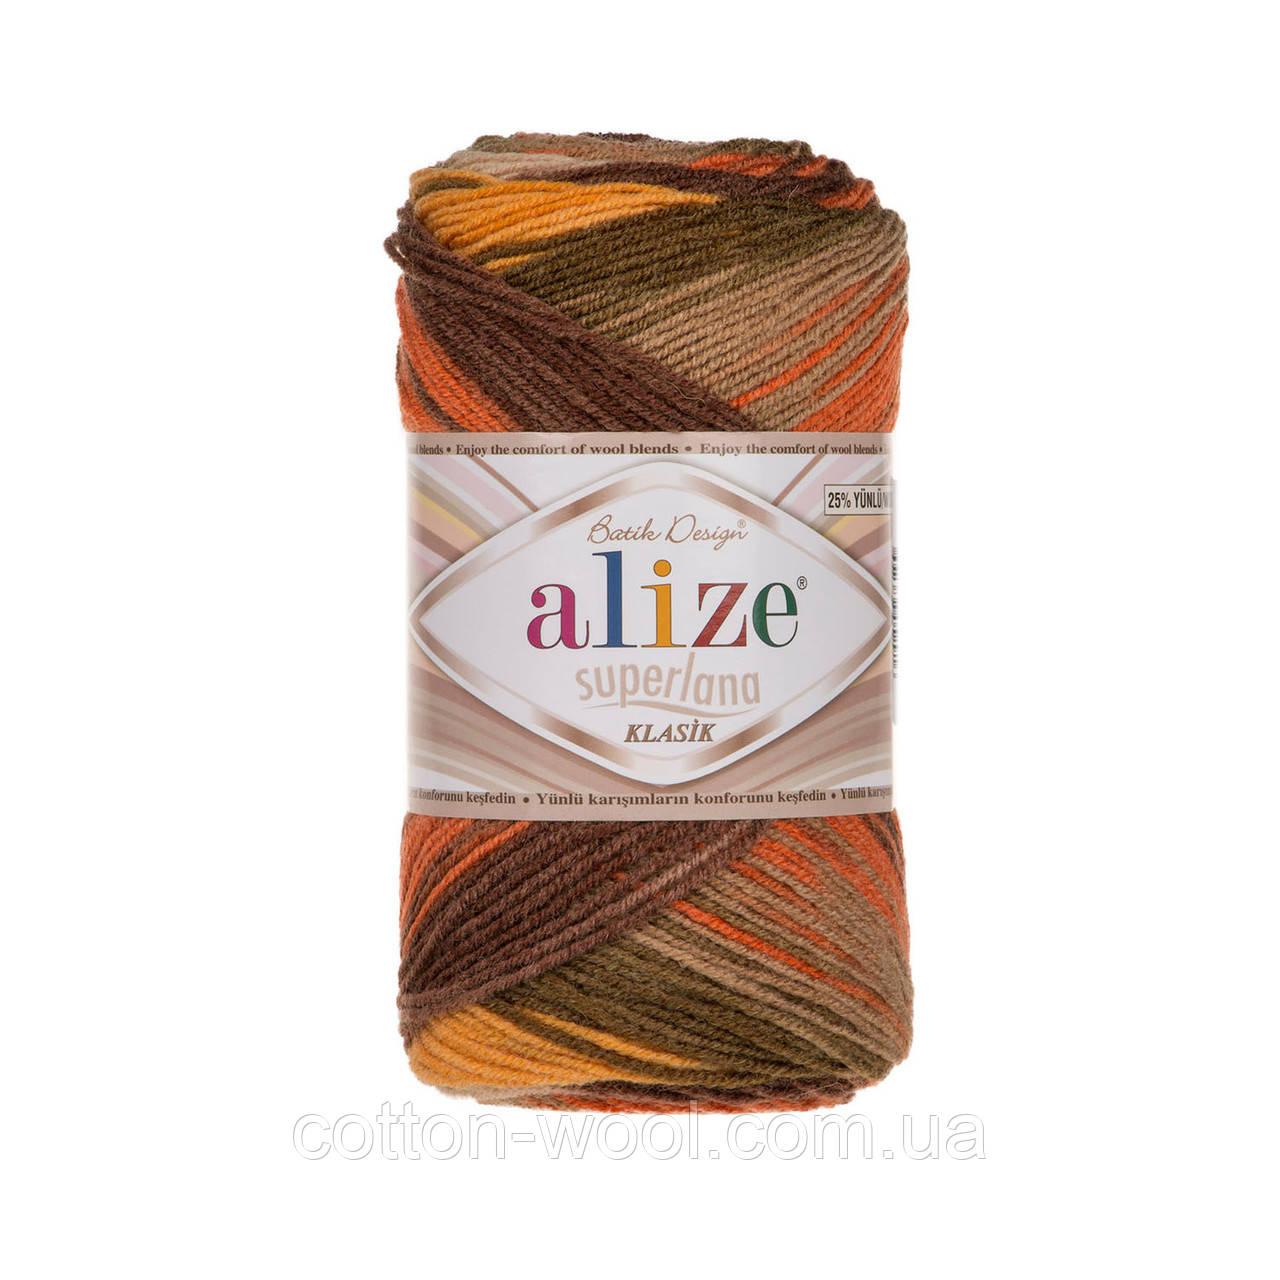 Alize Superlana Klasik Batik (Ализе Суперлана классик